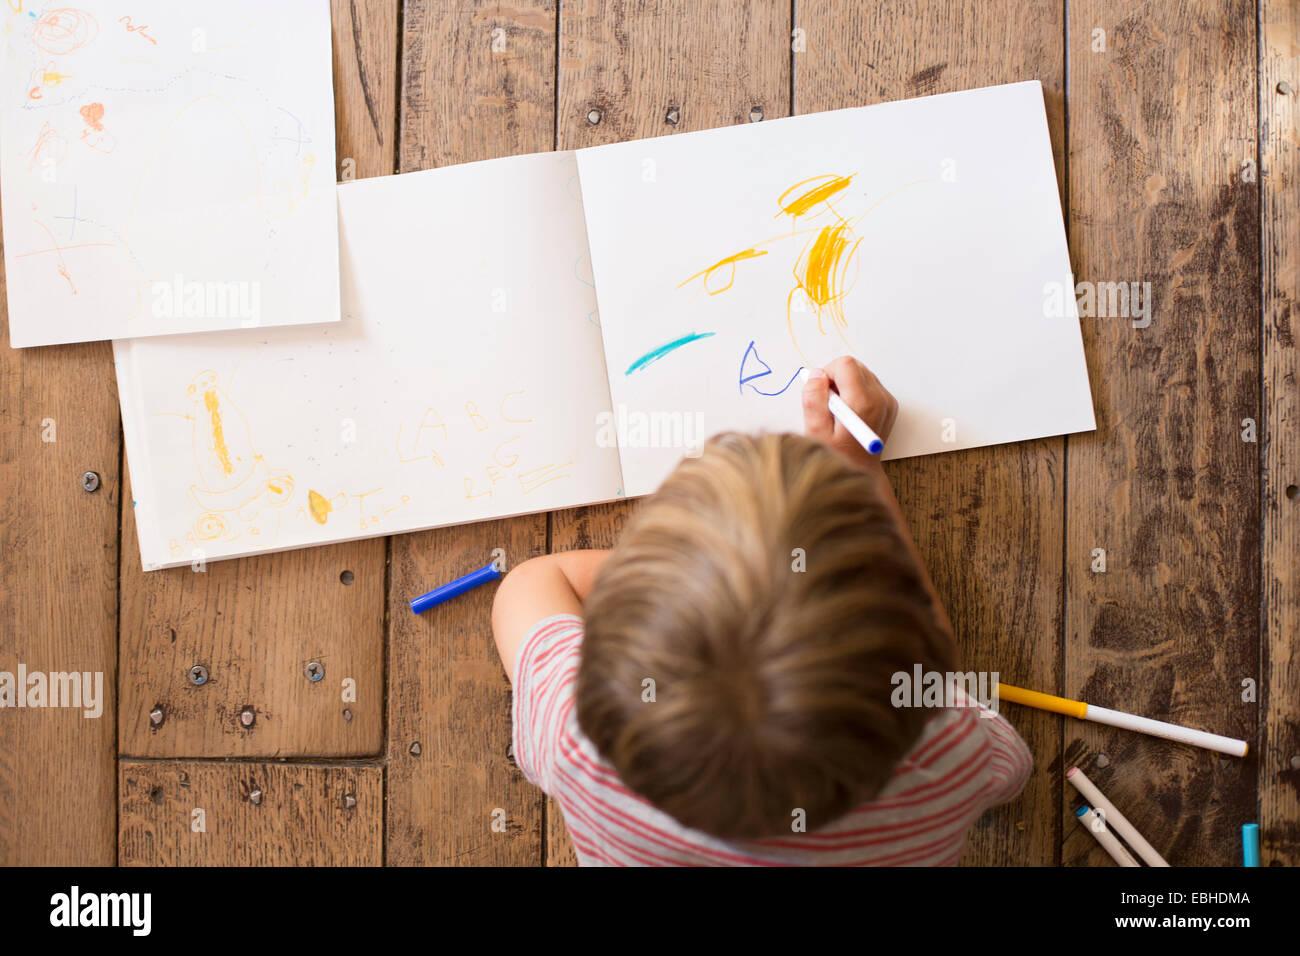 Joven dibujo sobre papel, ángulo alto Imagen De Stock